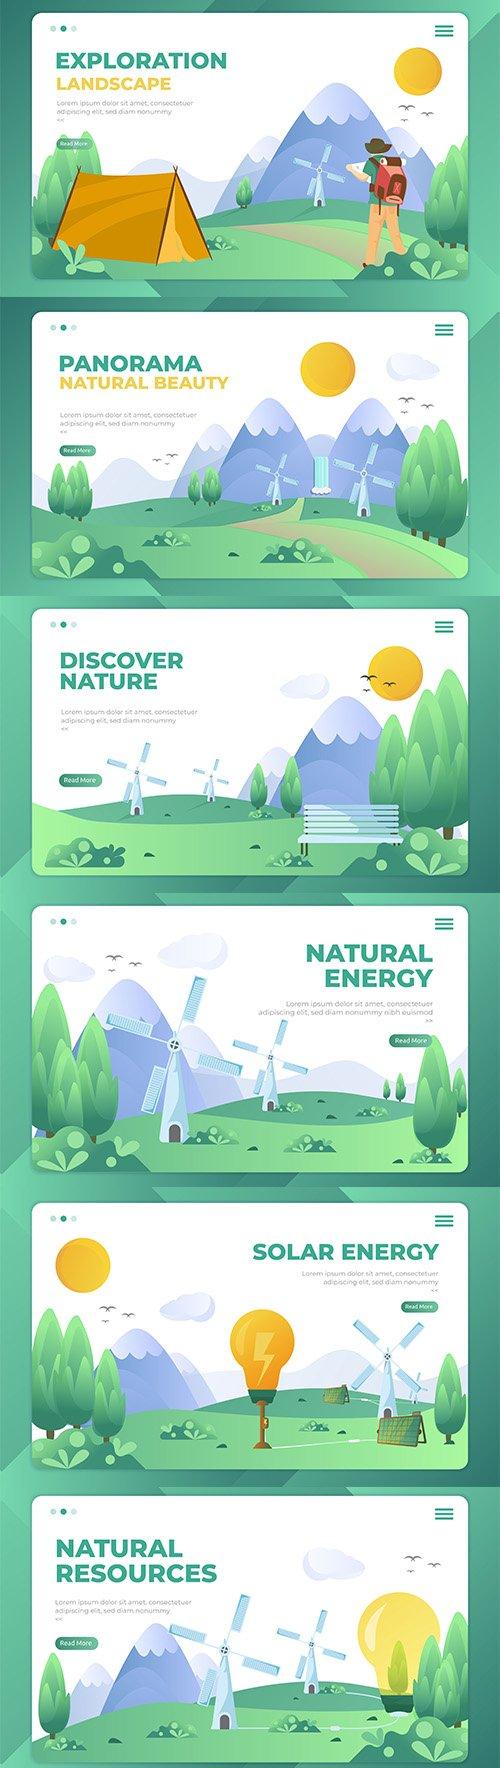 Natural Resources Landing Page Templates Set